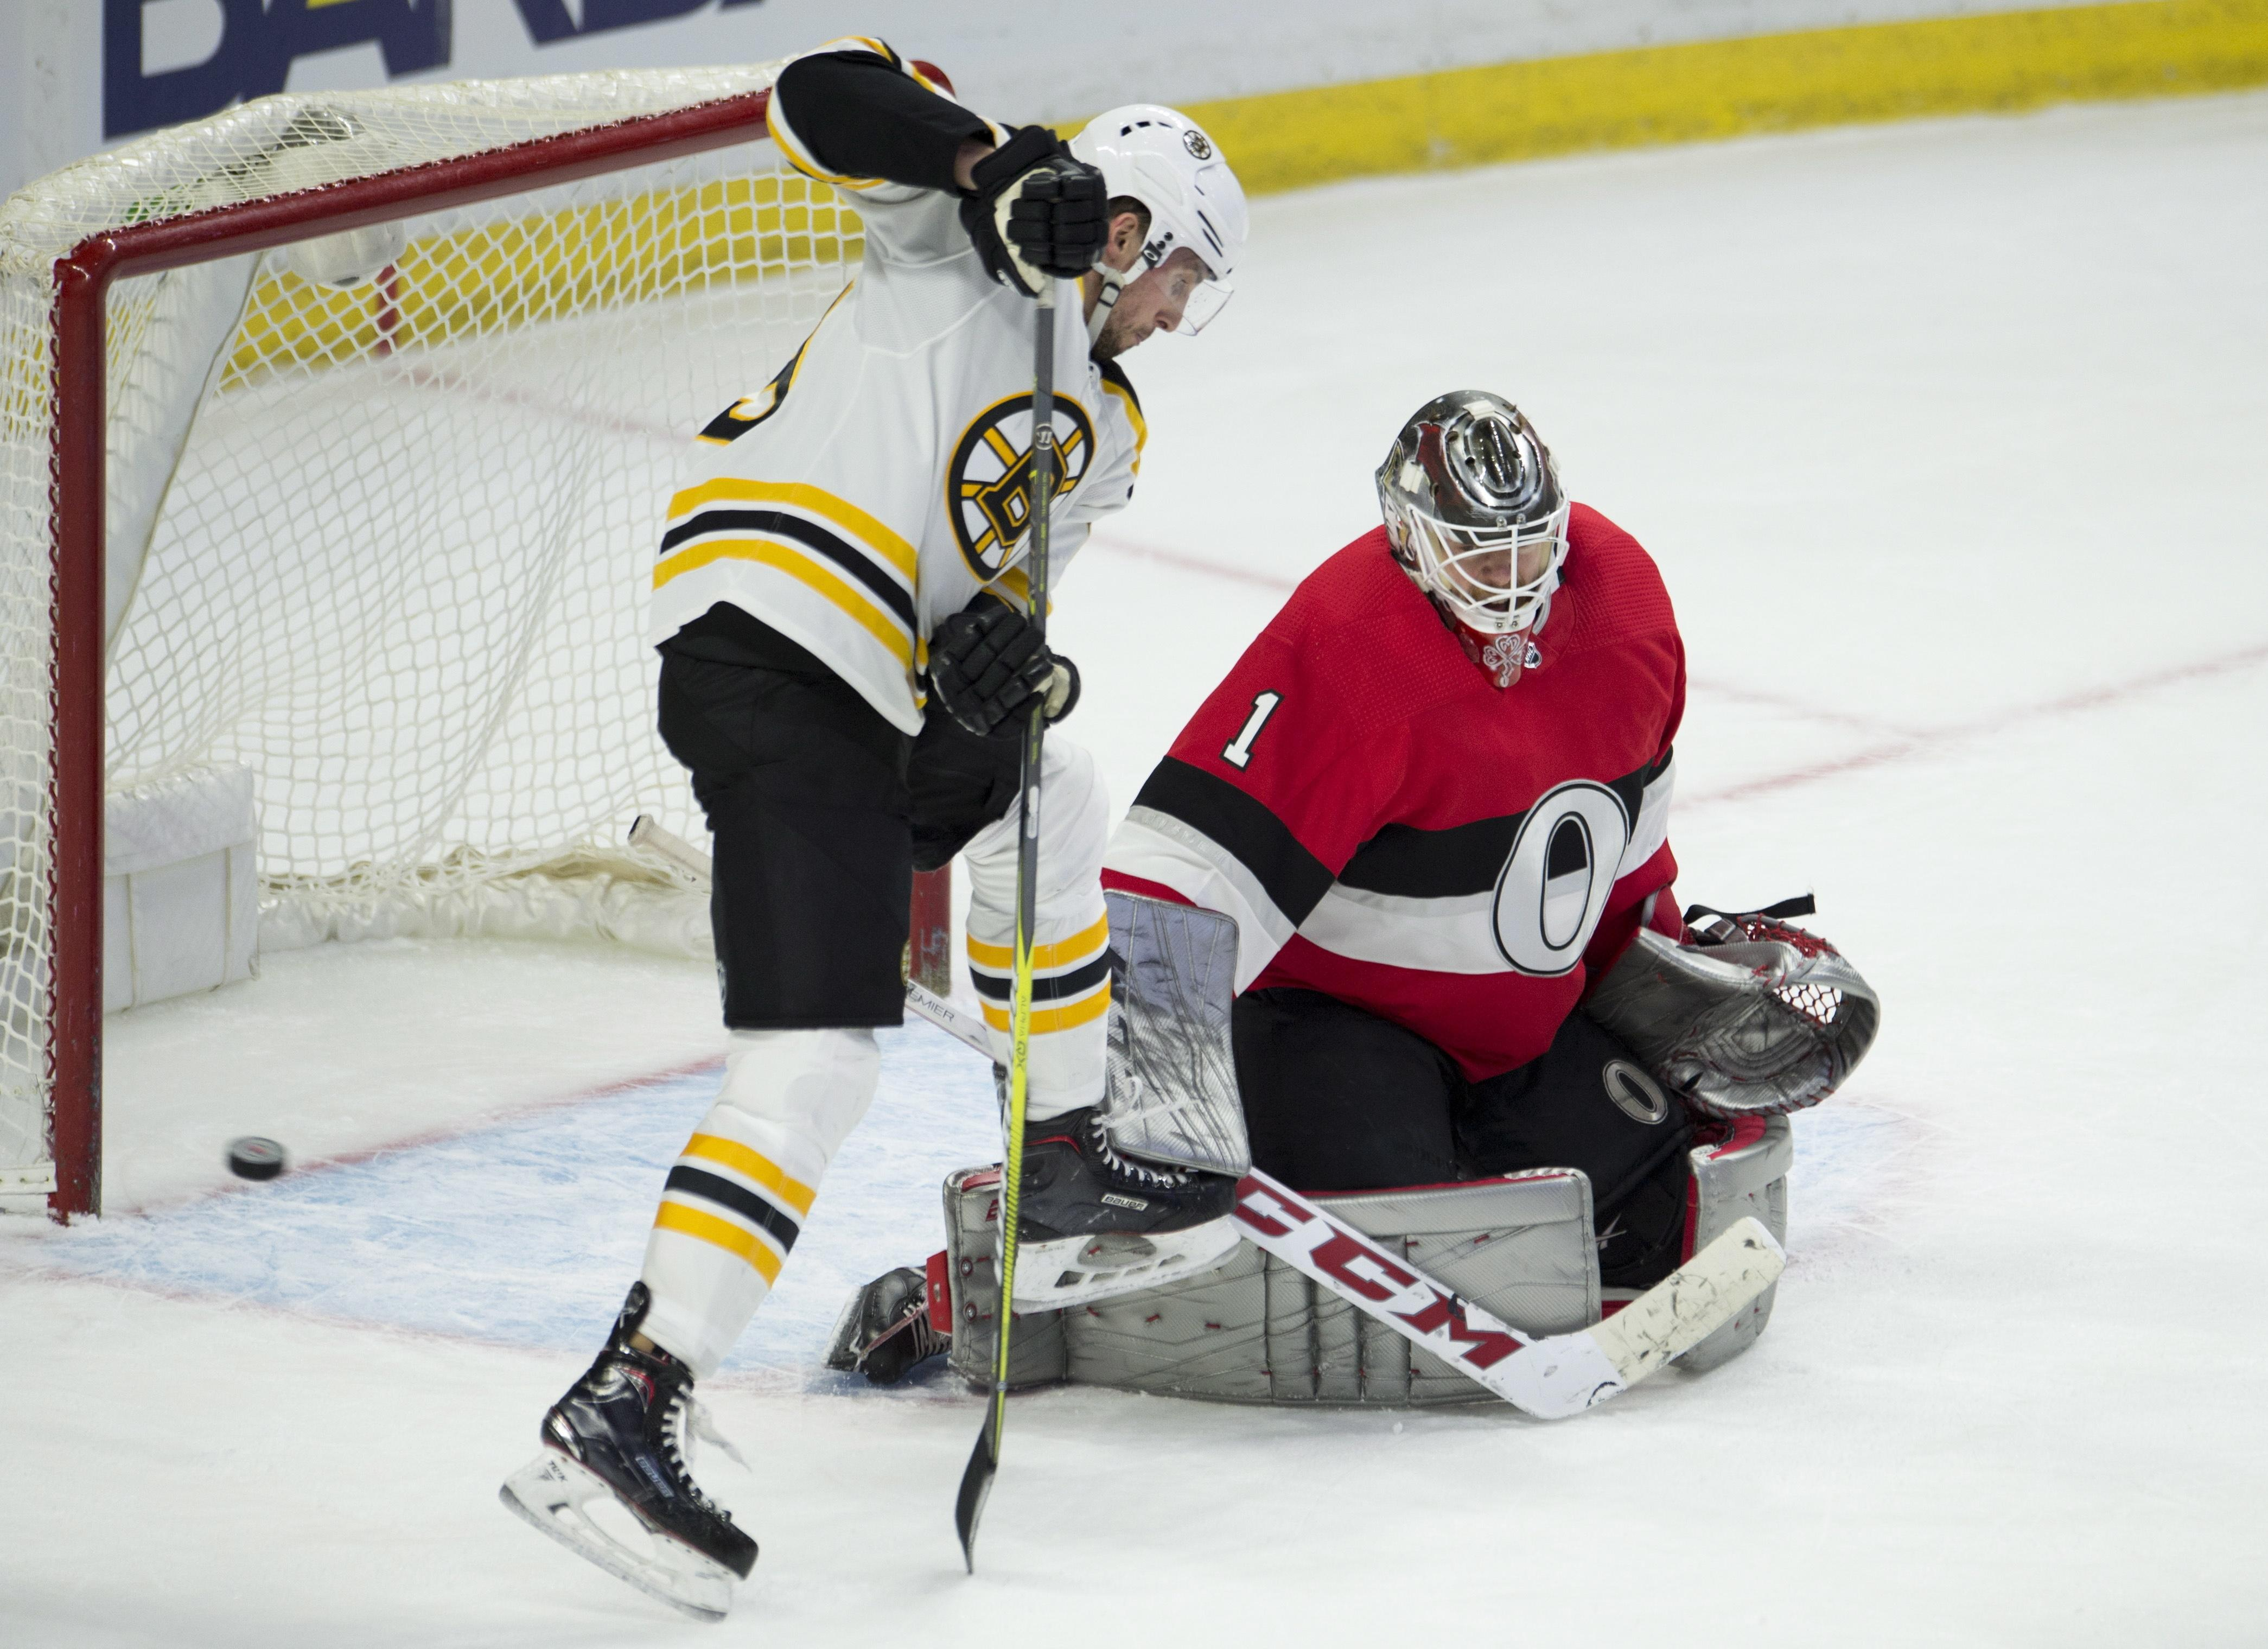 Bruins_senators_hockey_15985